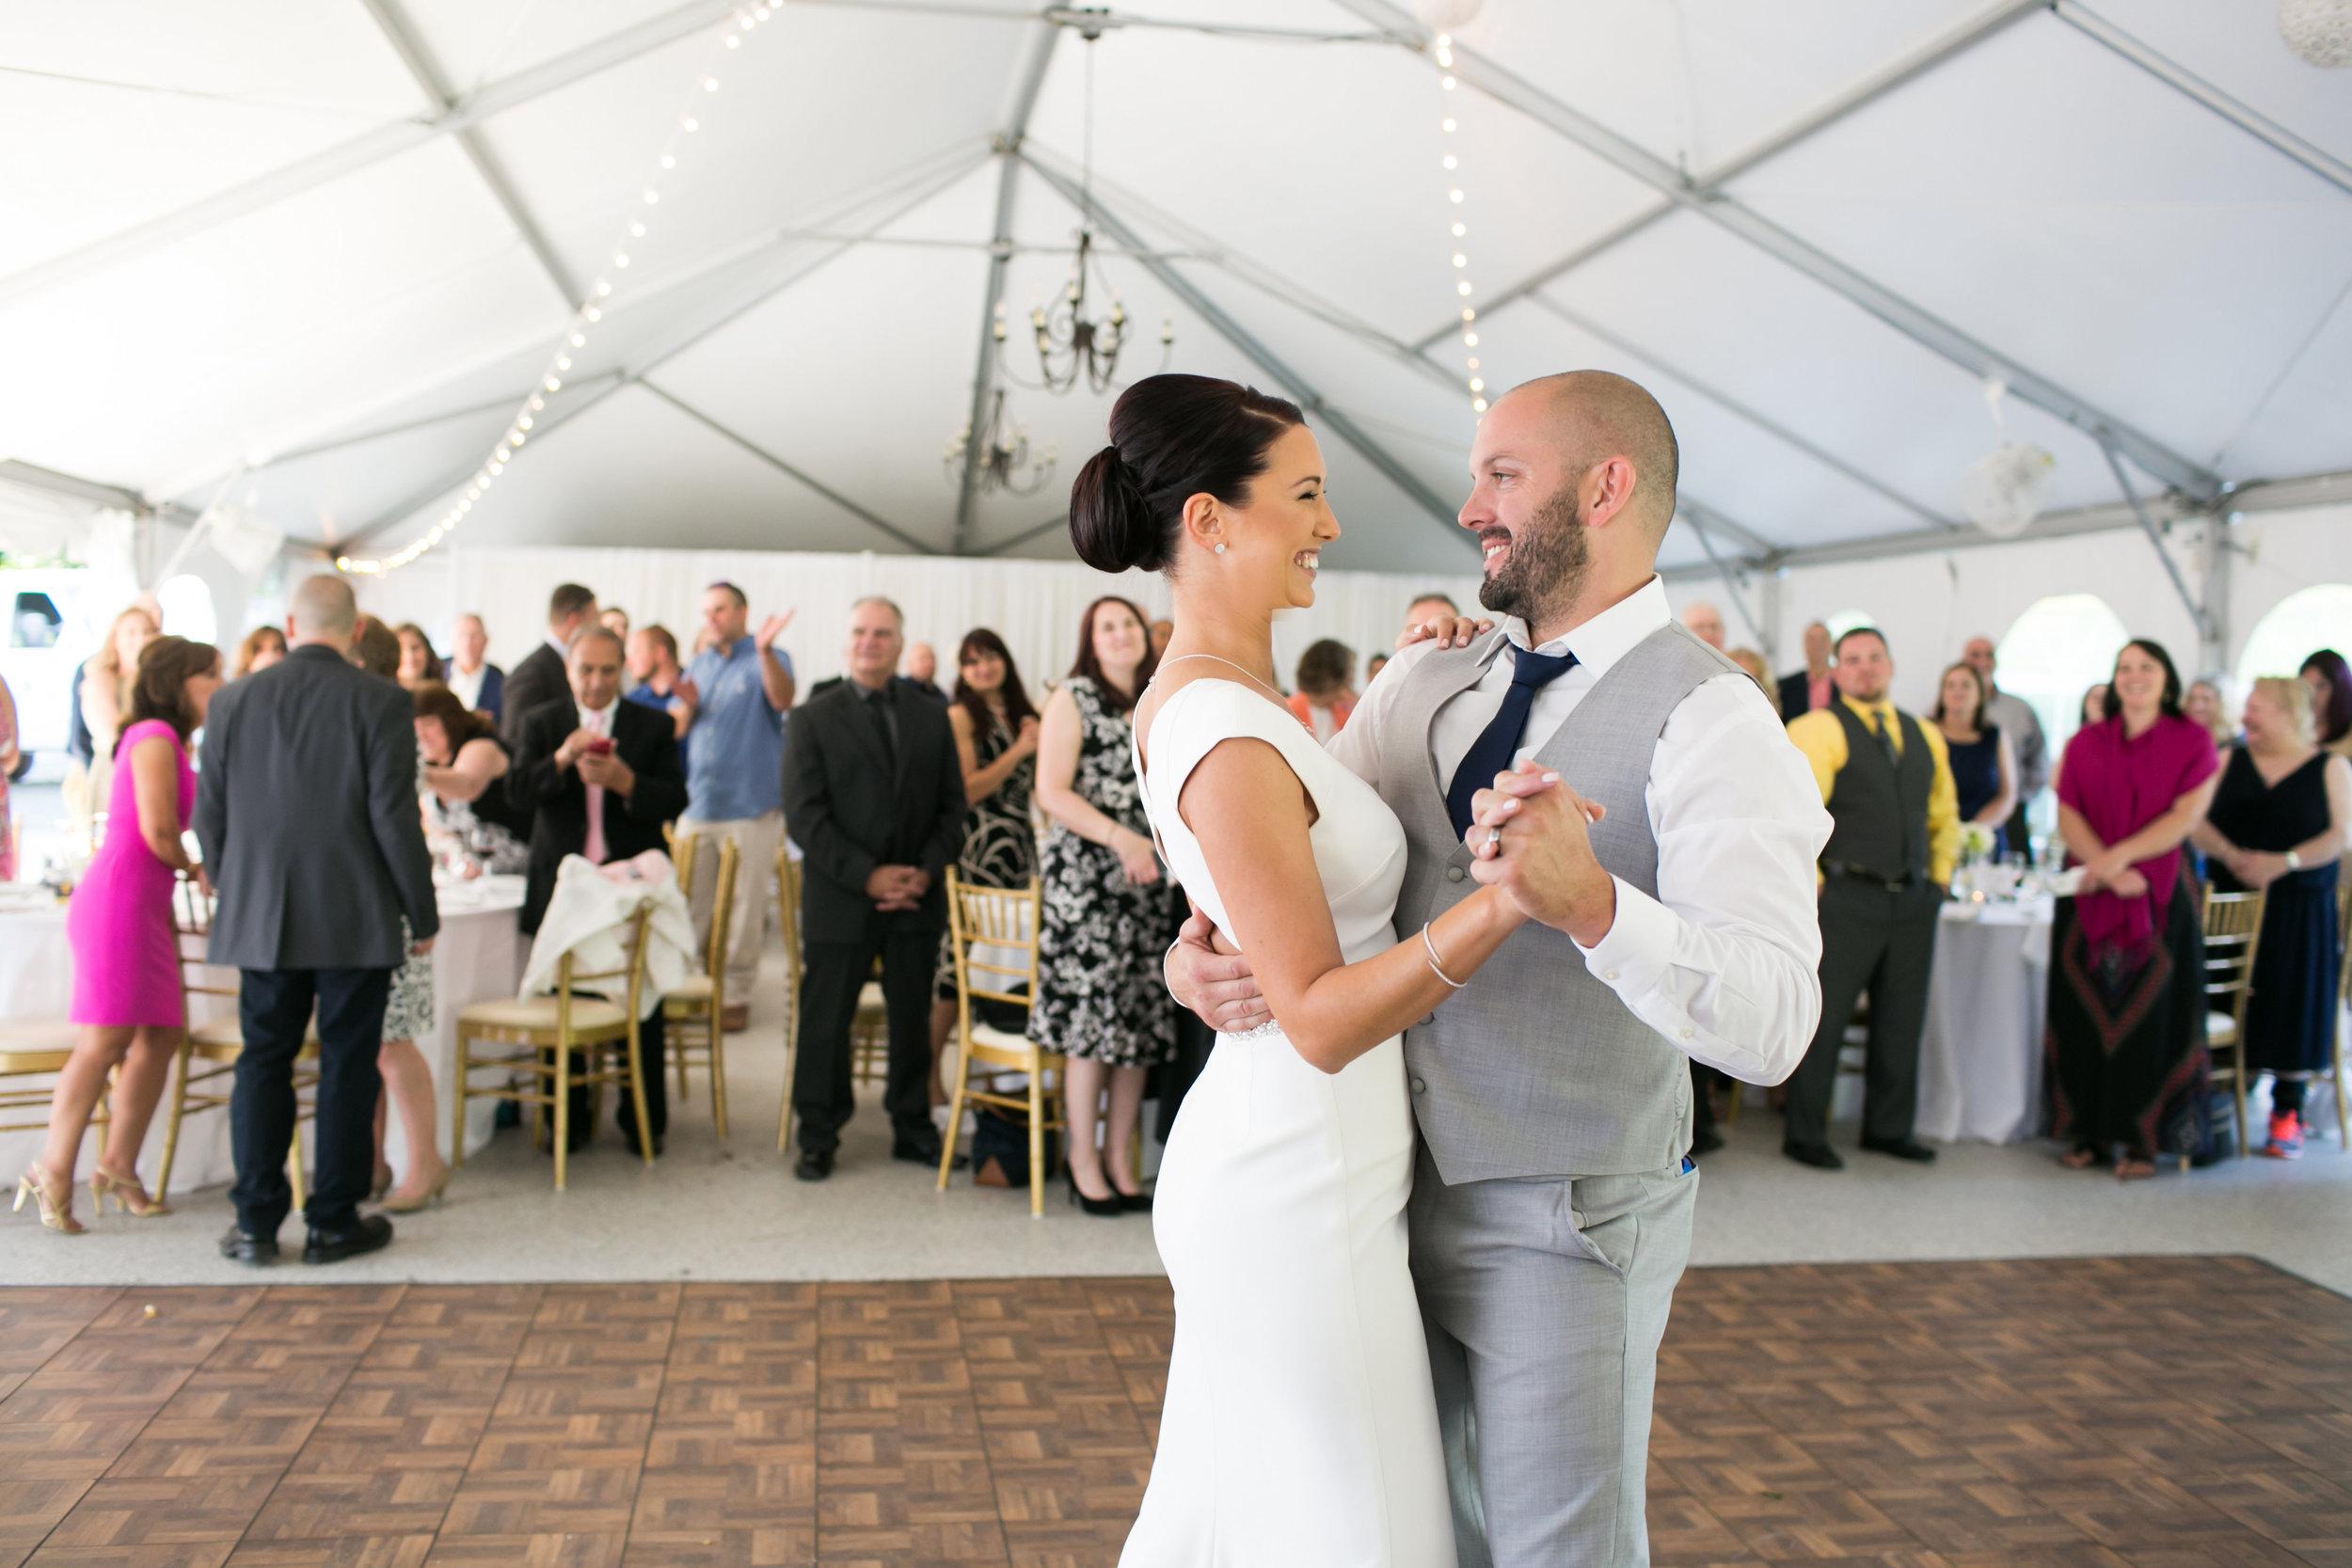 Pure elegance events Tynise Kee dc wedding planner va wedding planner rust manor house leesburg -0057.jpg